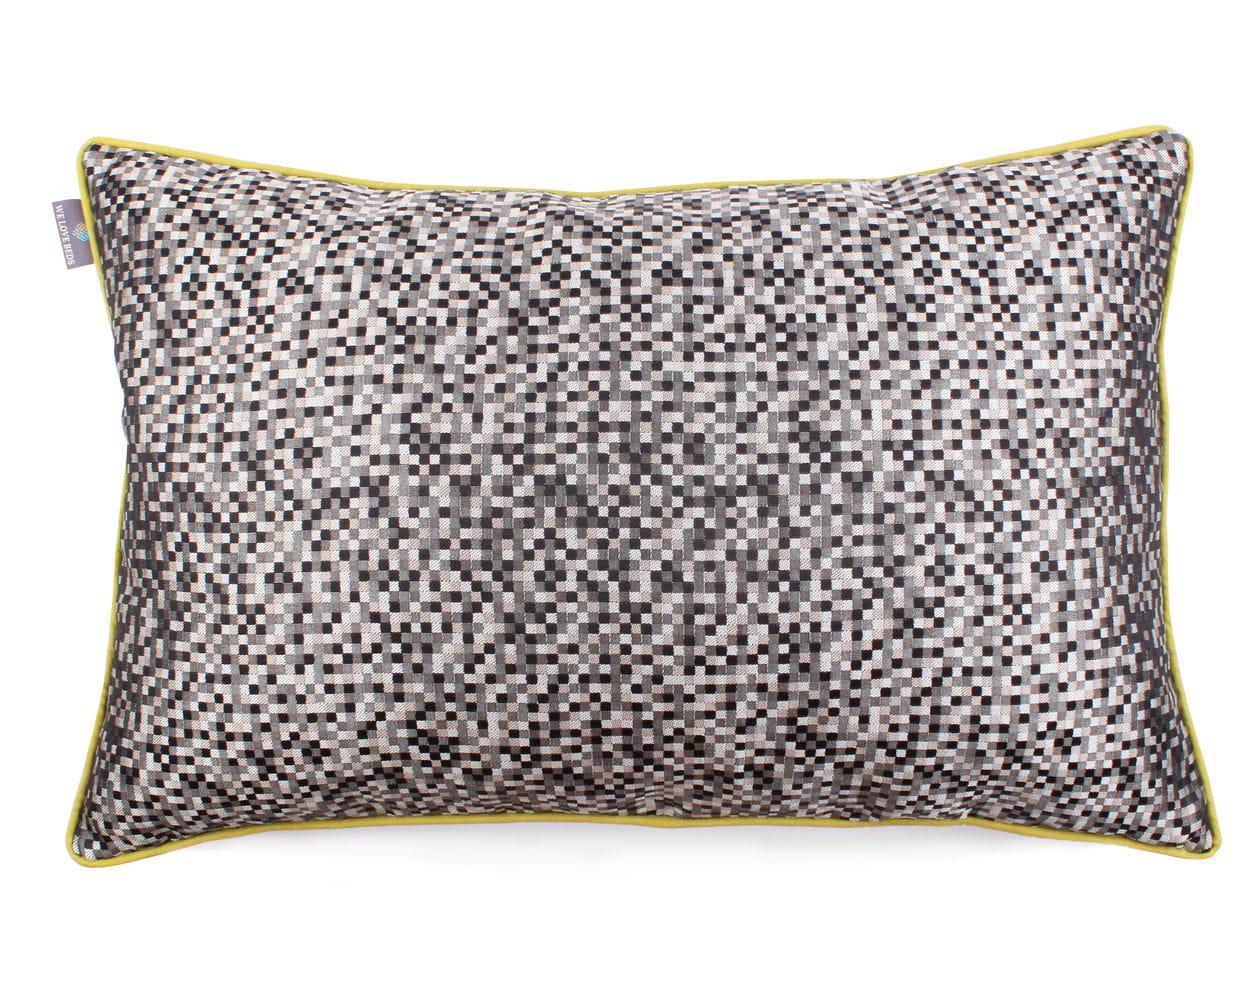 Poduszka dekoracyjna Mosaic 40x60 cm - We Love Candles&We Love Beds